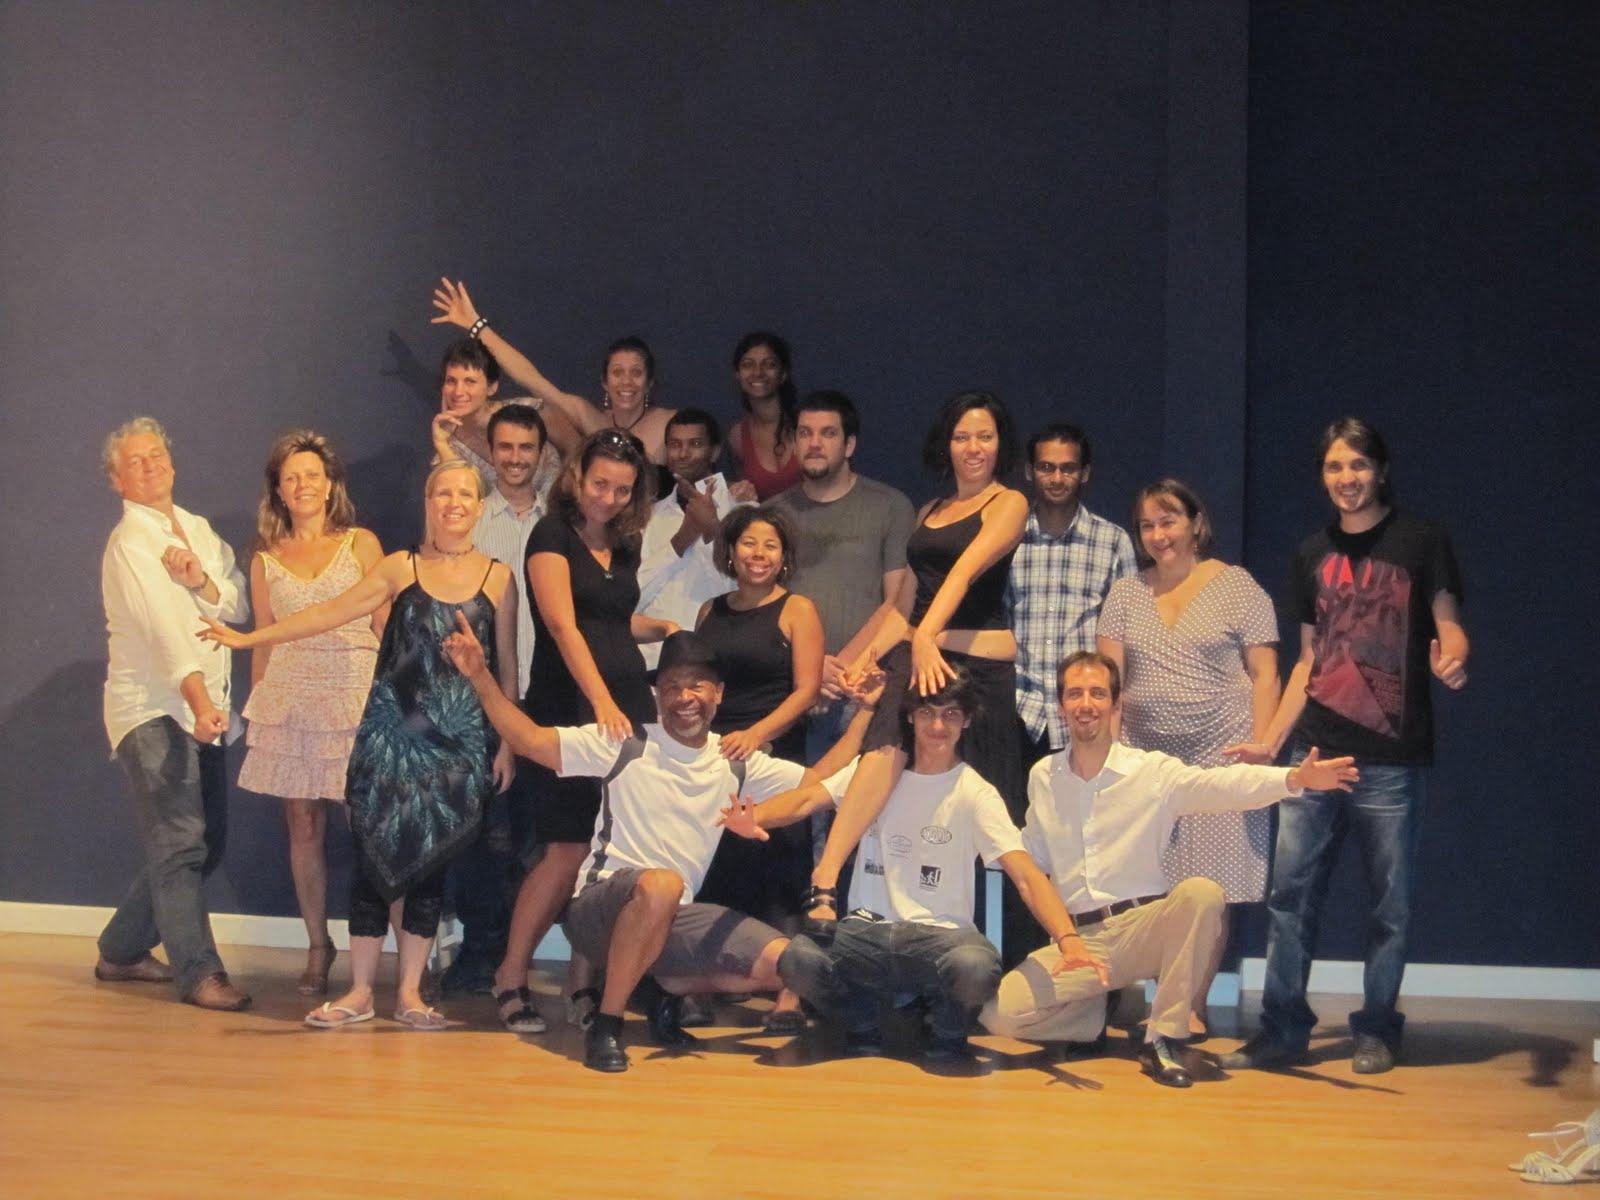 rencontre internationale de tango argentin